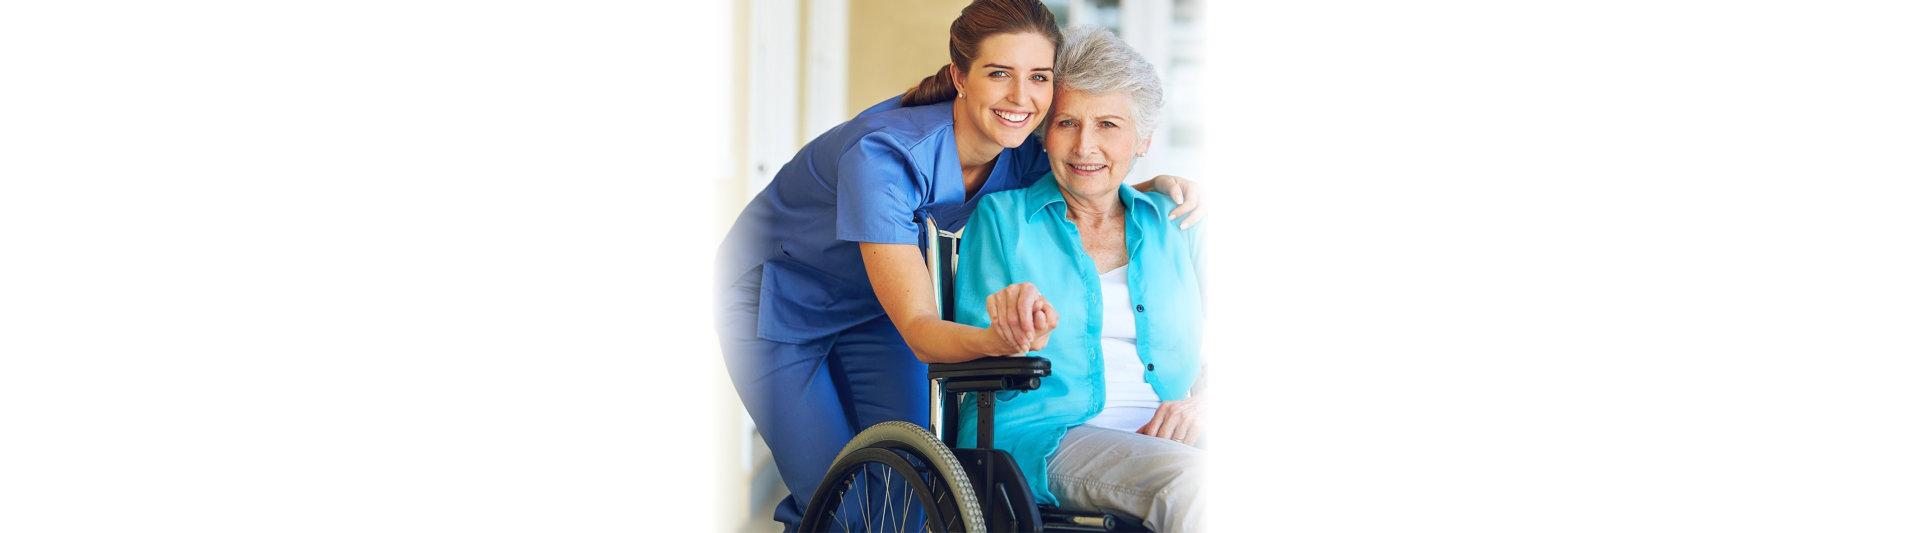 caregiver and elderwoman smiling